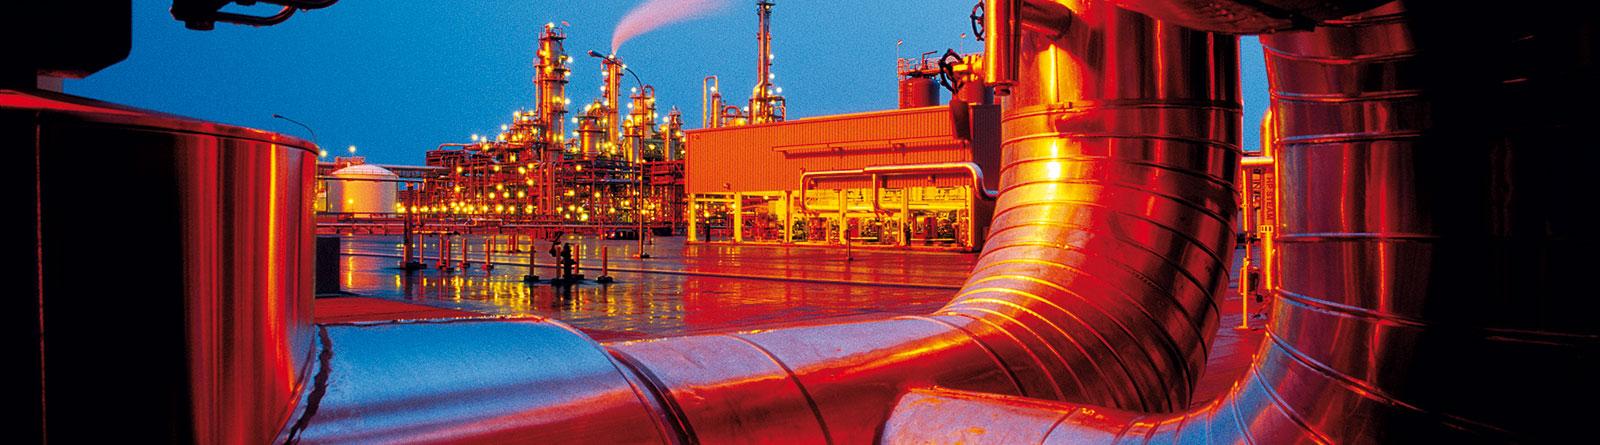 Chemical Expansion Joints Trelleborg Fluid Handling